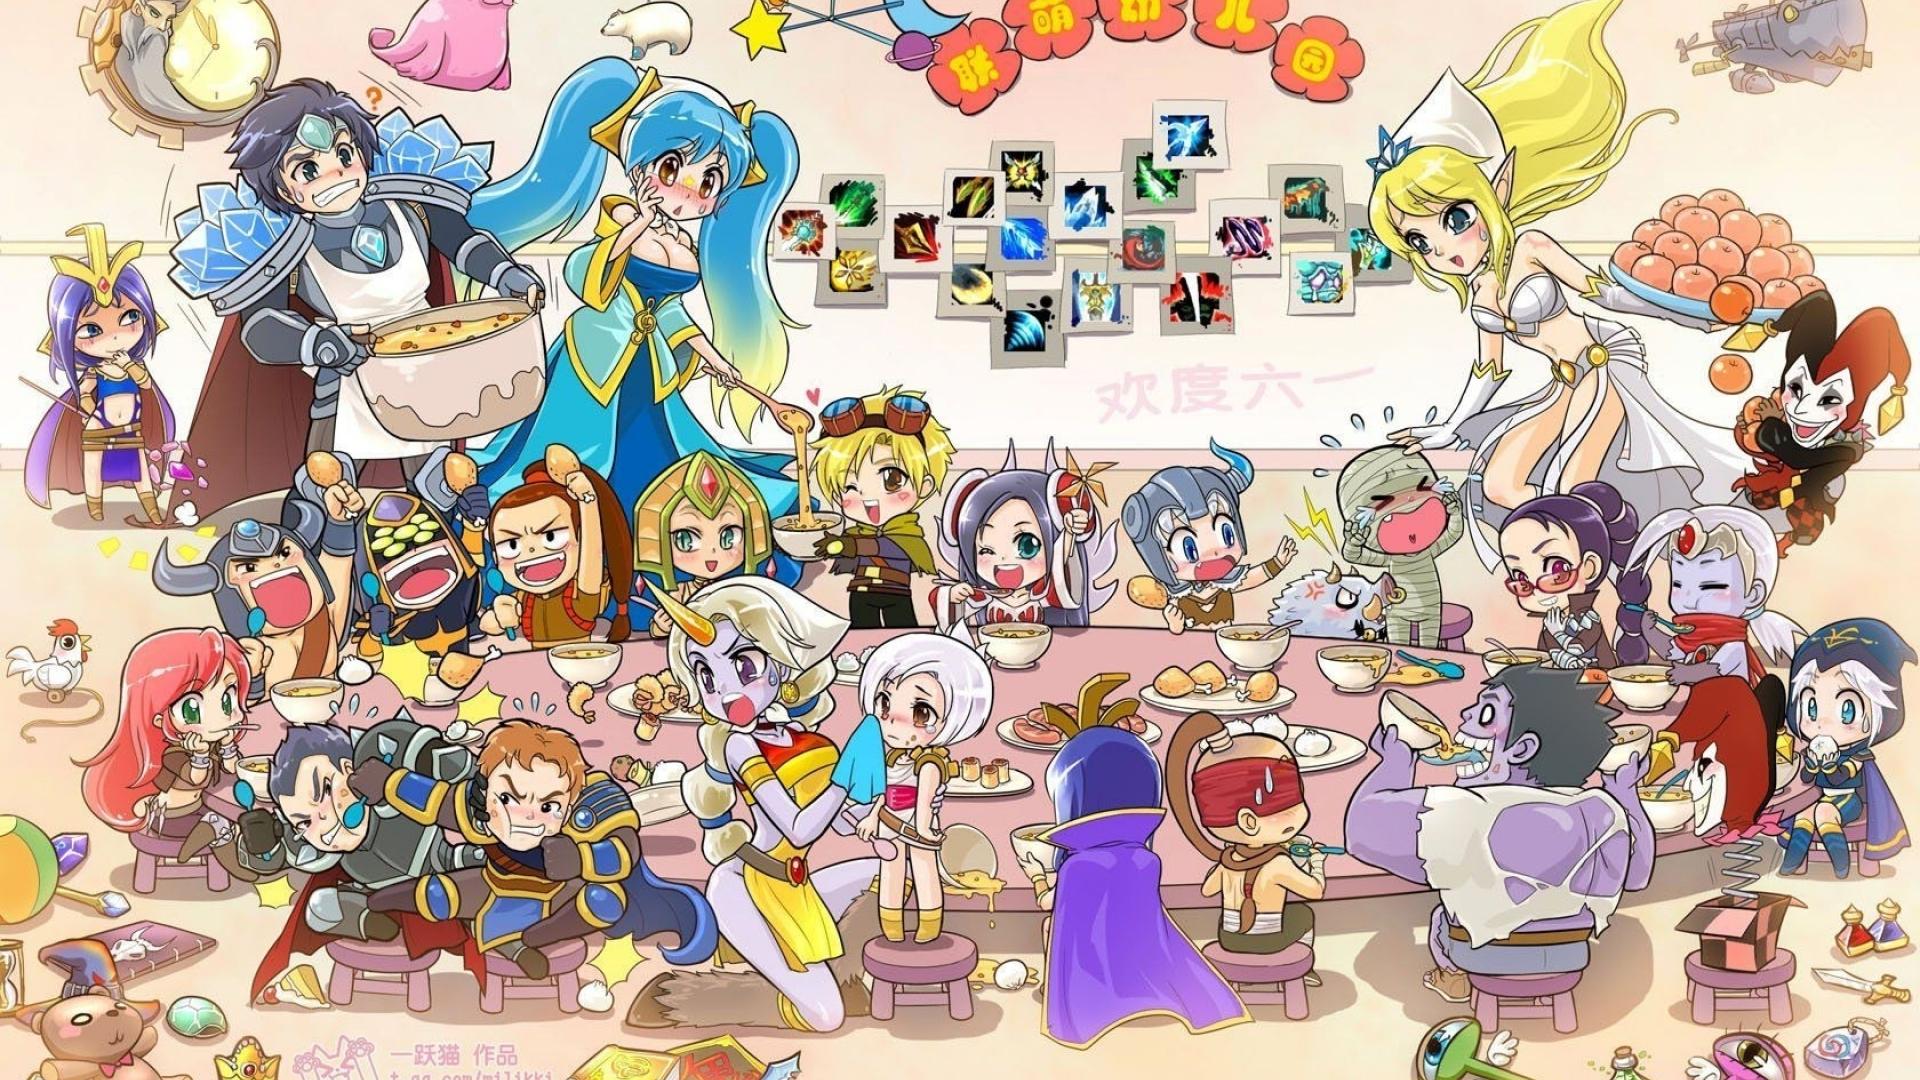 Free Download Video Games Chibi League Of Legends Soraka Shaco